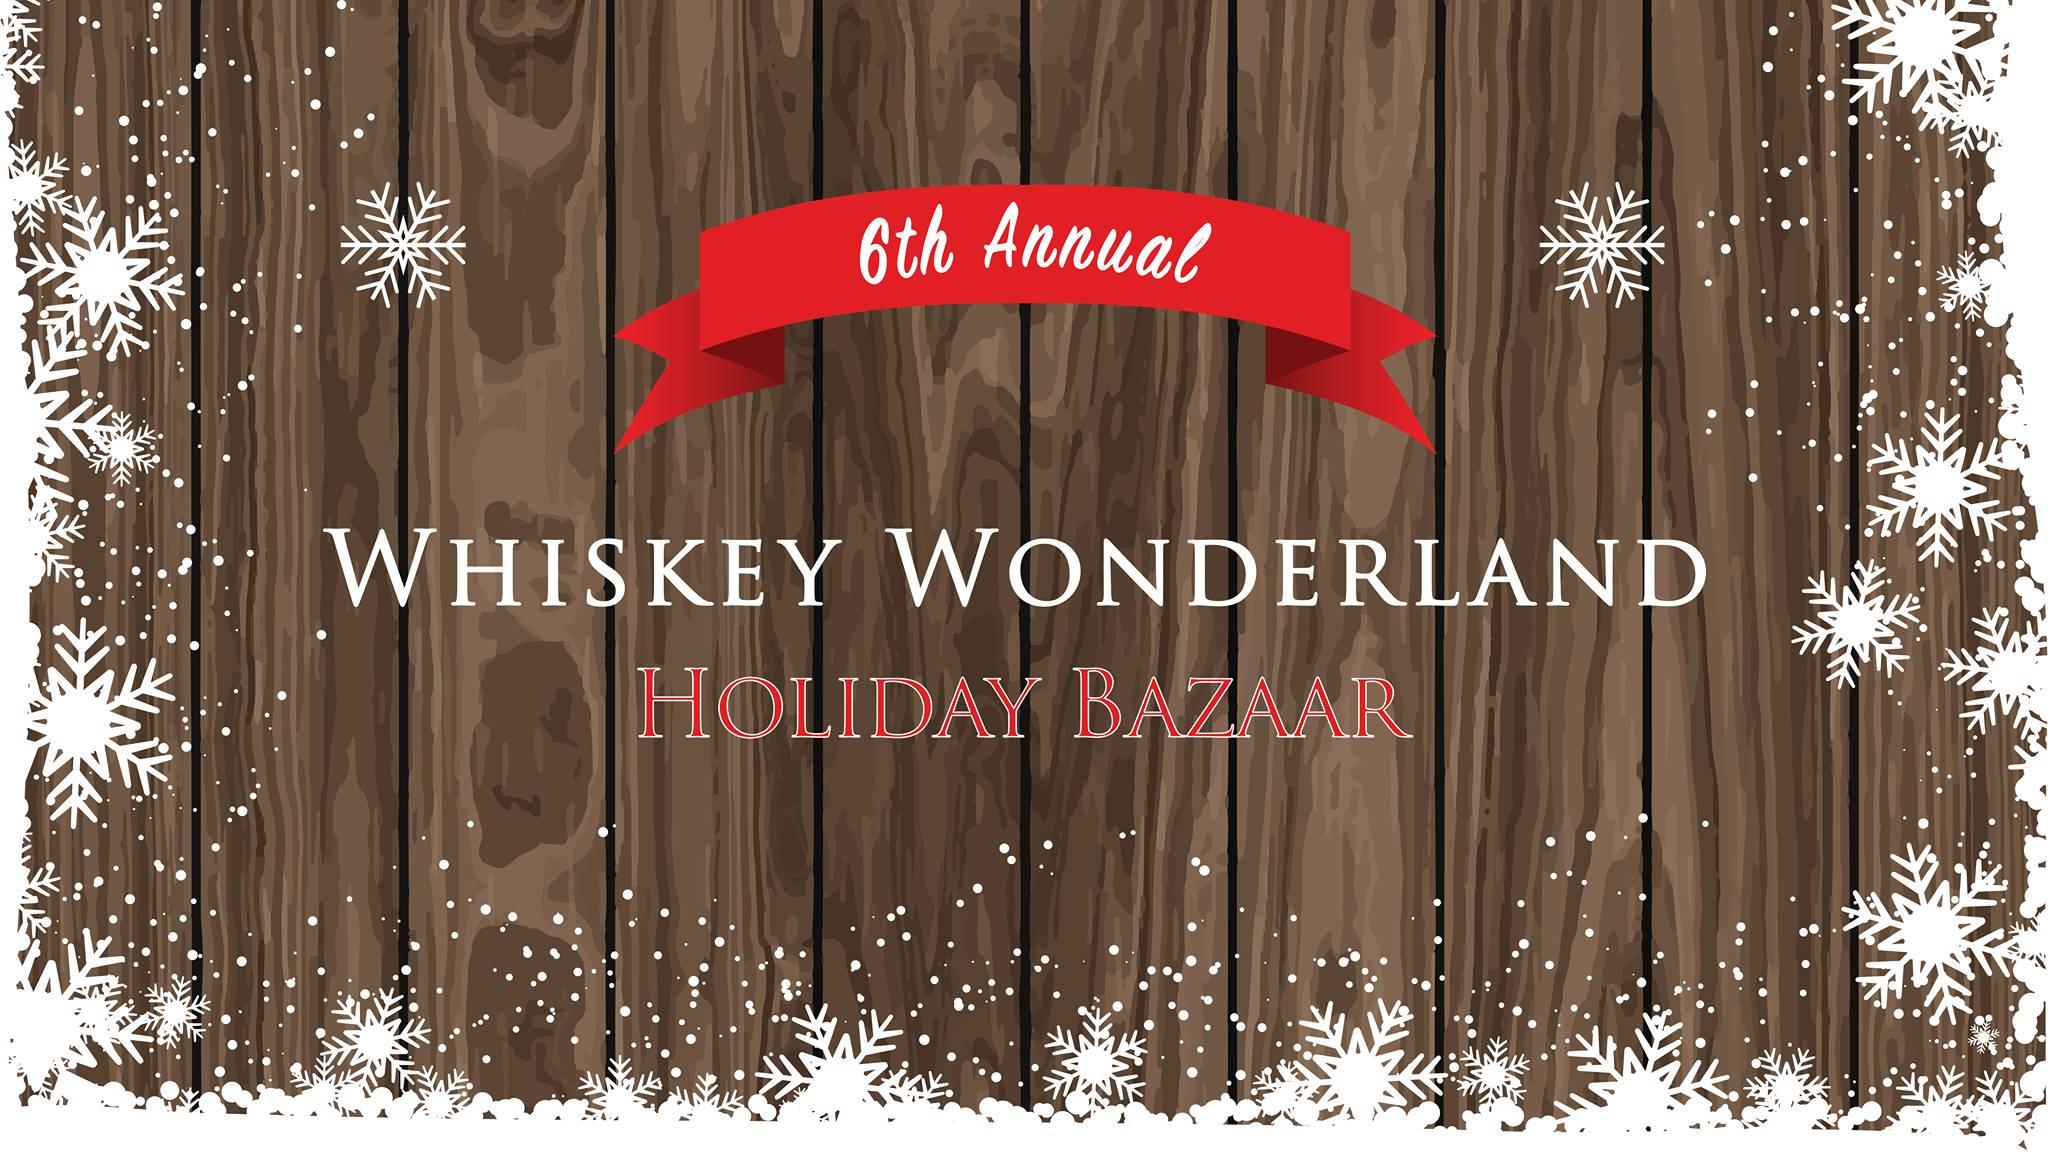 December 14 -15, 2018: Whiskey Wonderland Holiday Bazaar